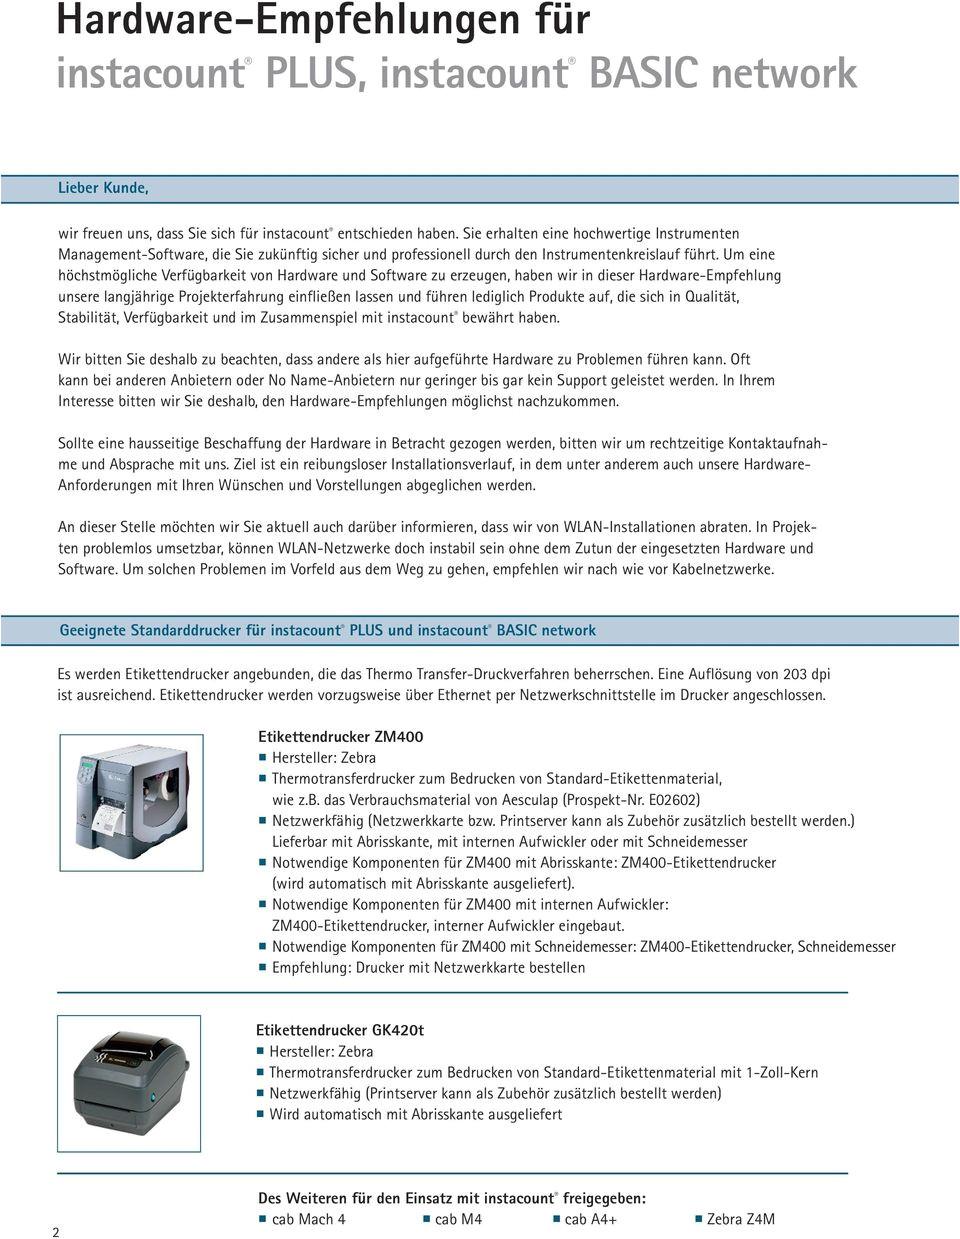 page 2 jpg